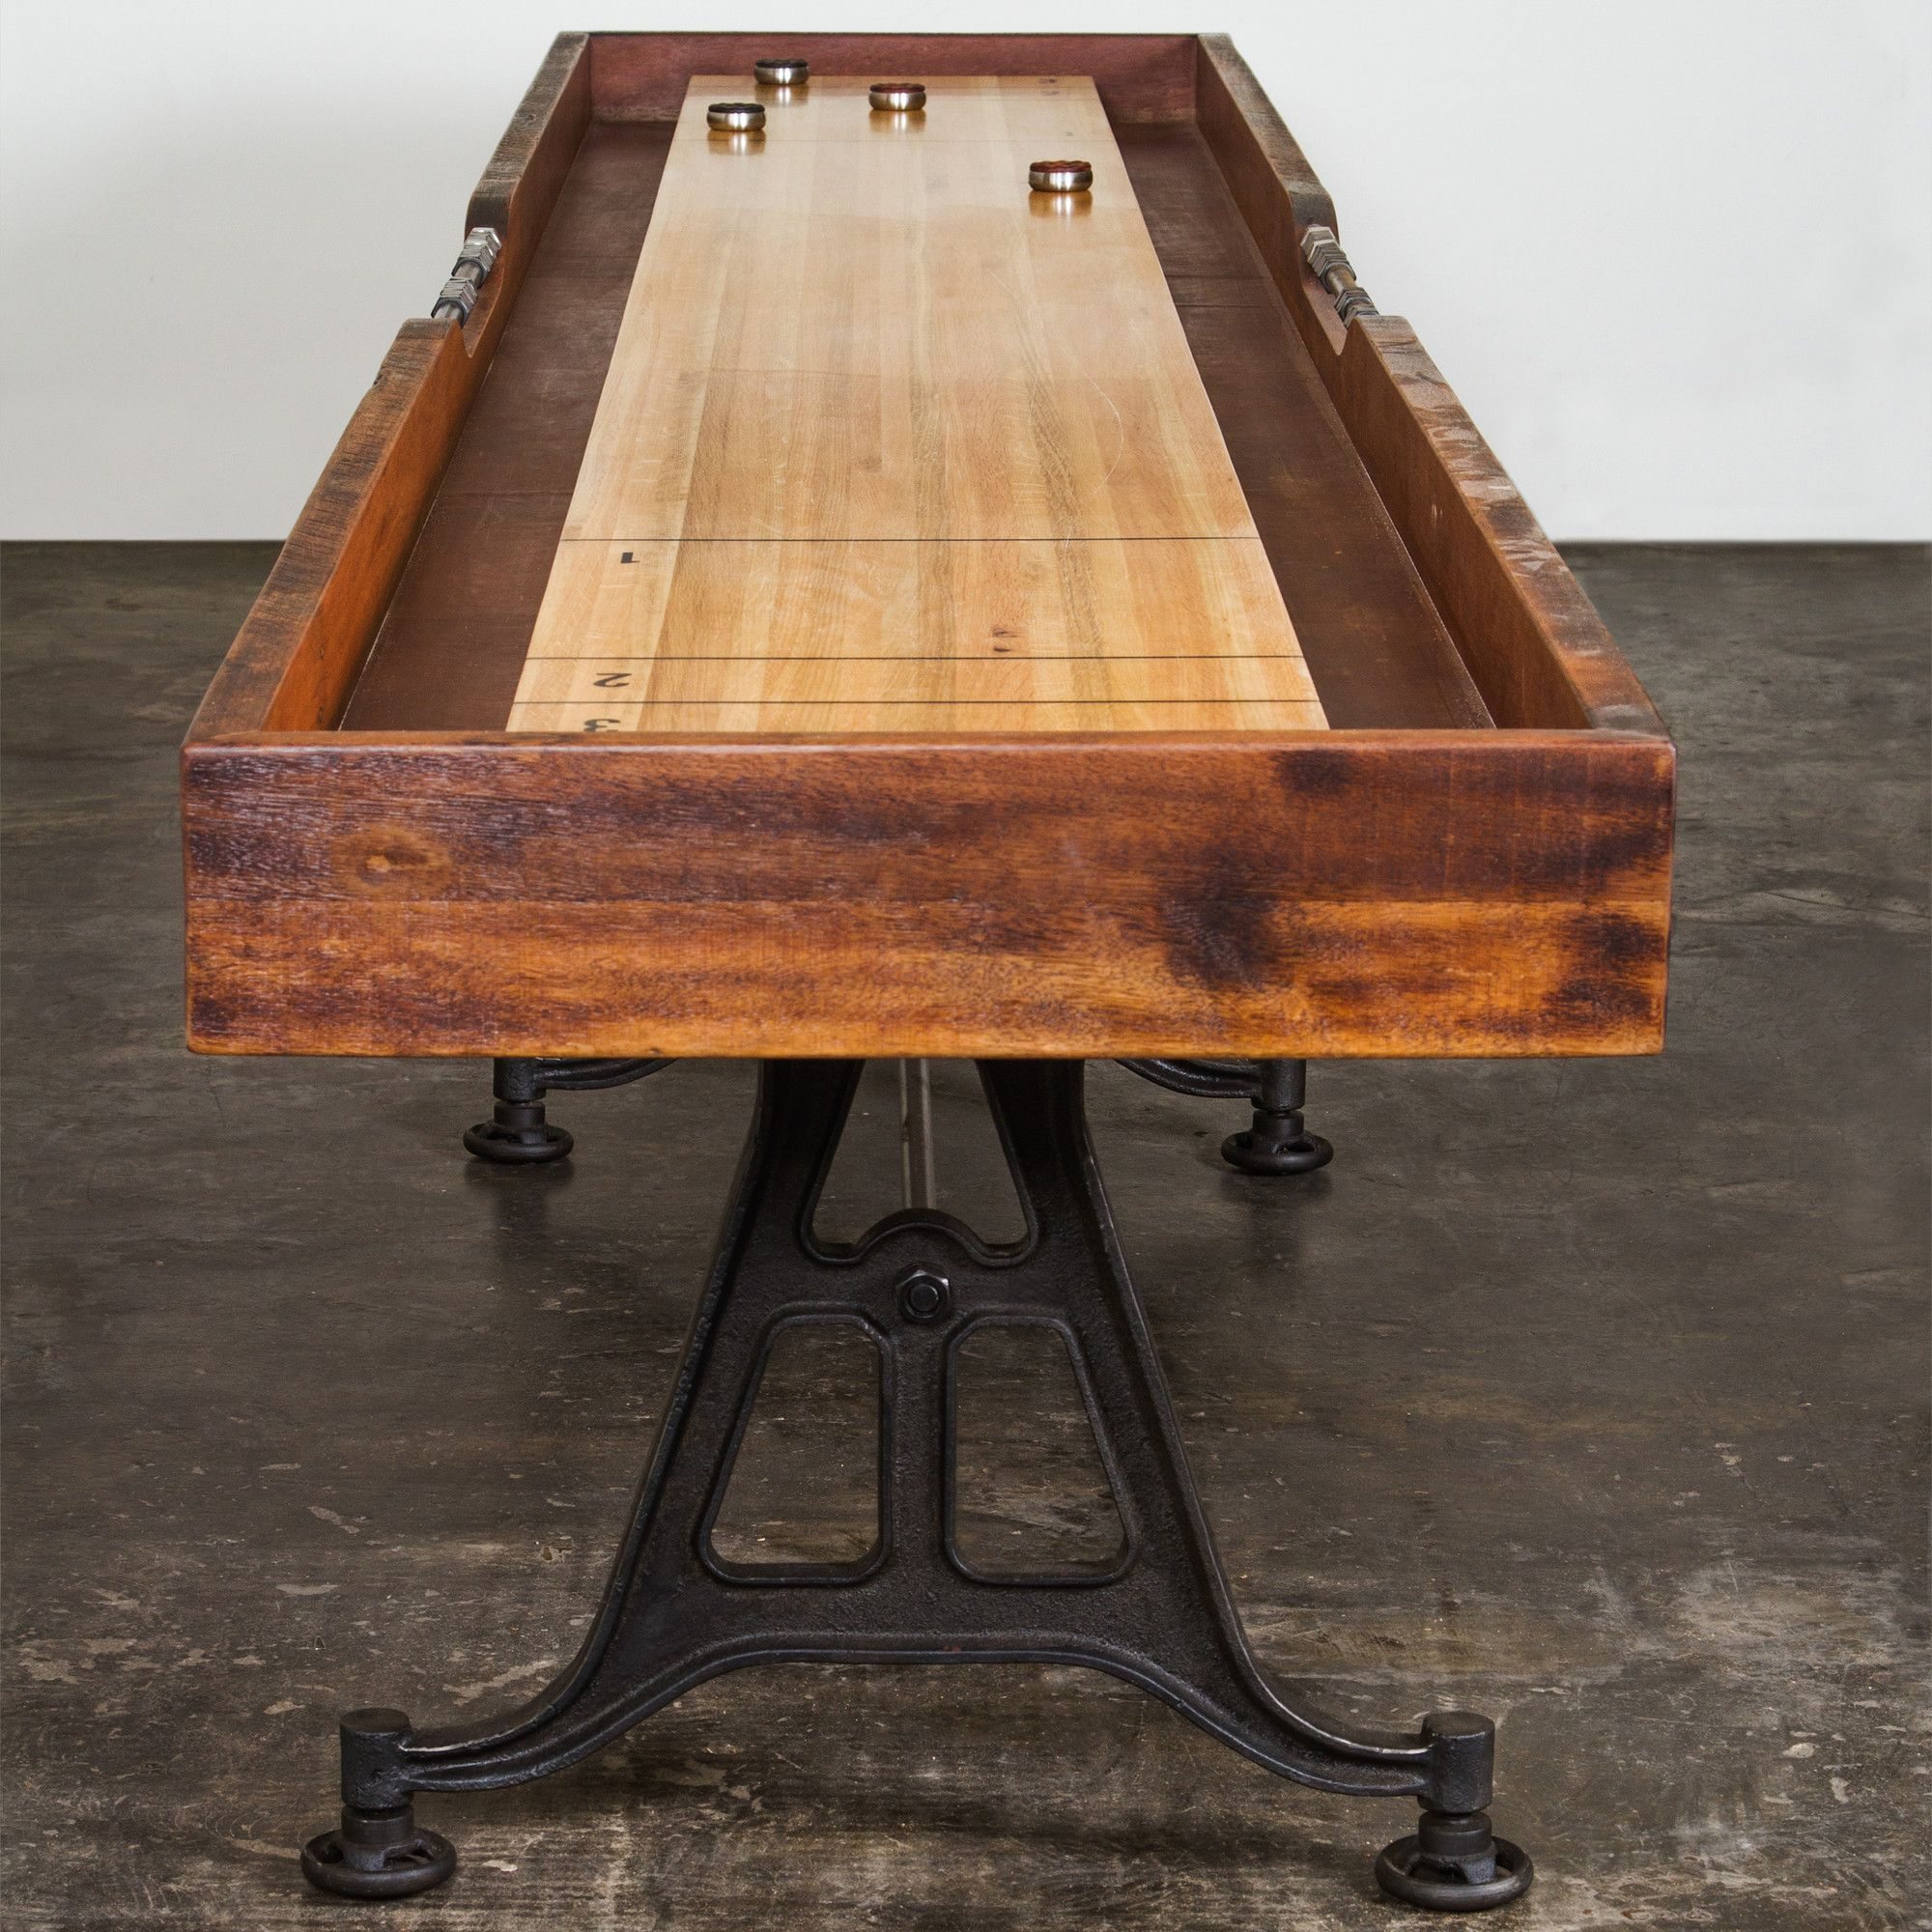 District Eight 12' Shuffleboard Table Shuffleboard table